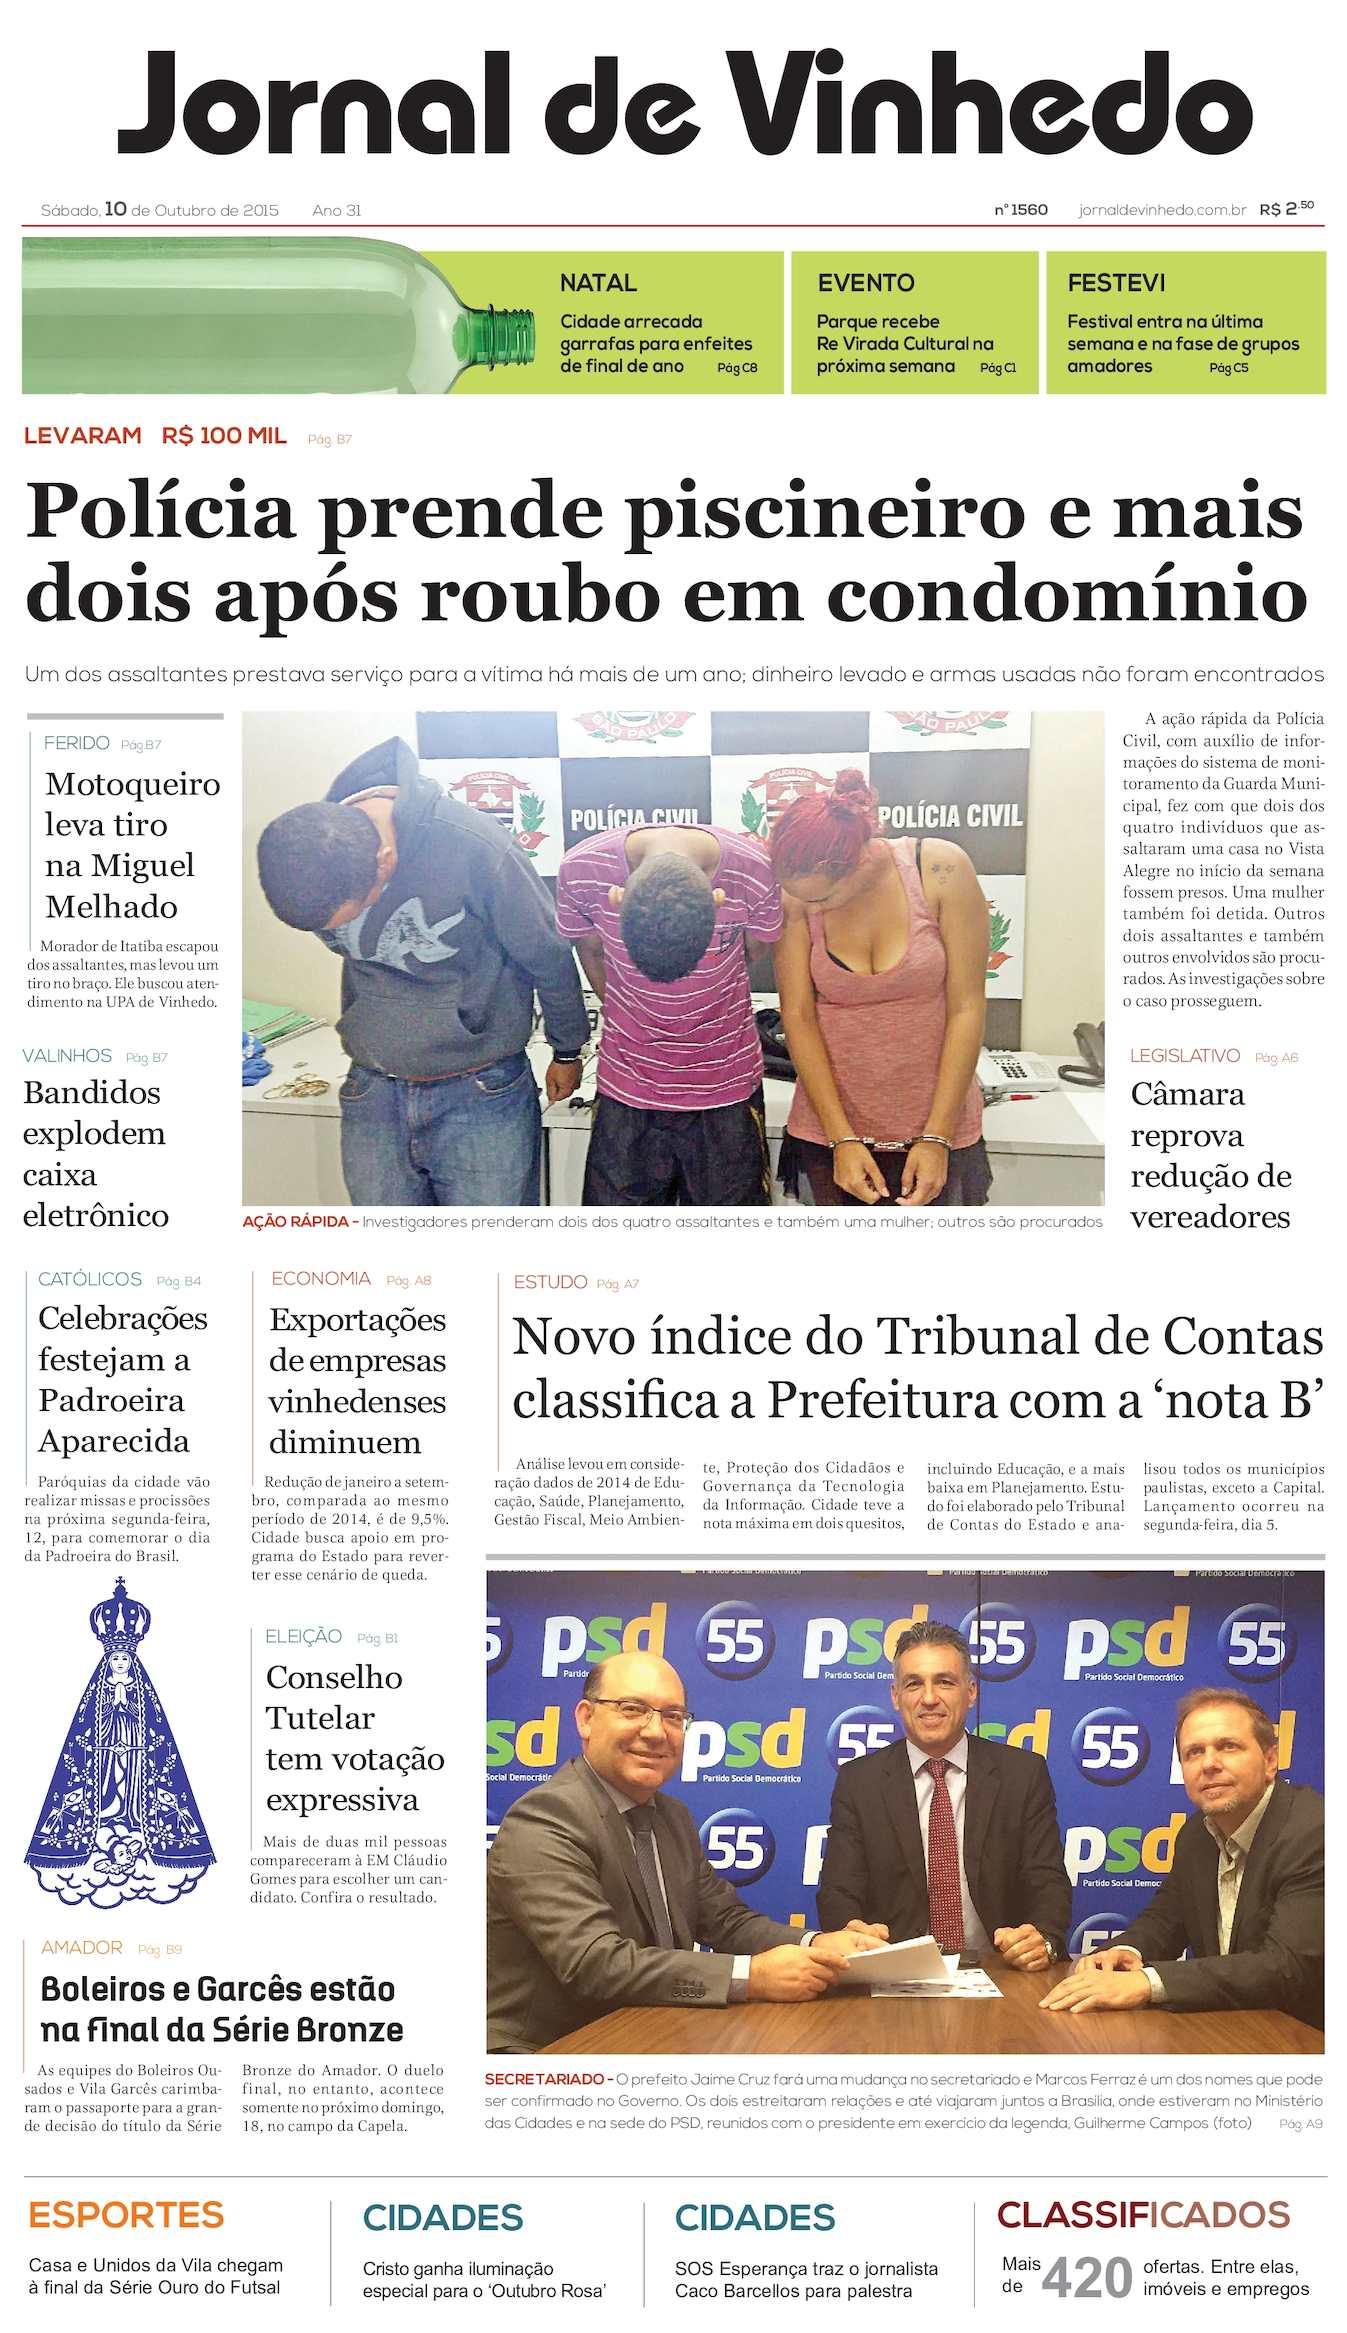 Calaméo - Jornal De Vinhedo Sábado 10 De Outubro De 2015 Edic 1560 Ok 014a338d75a61